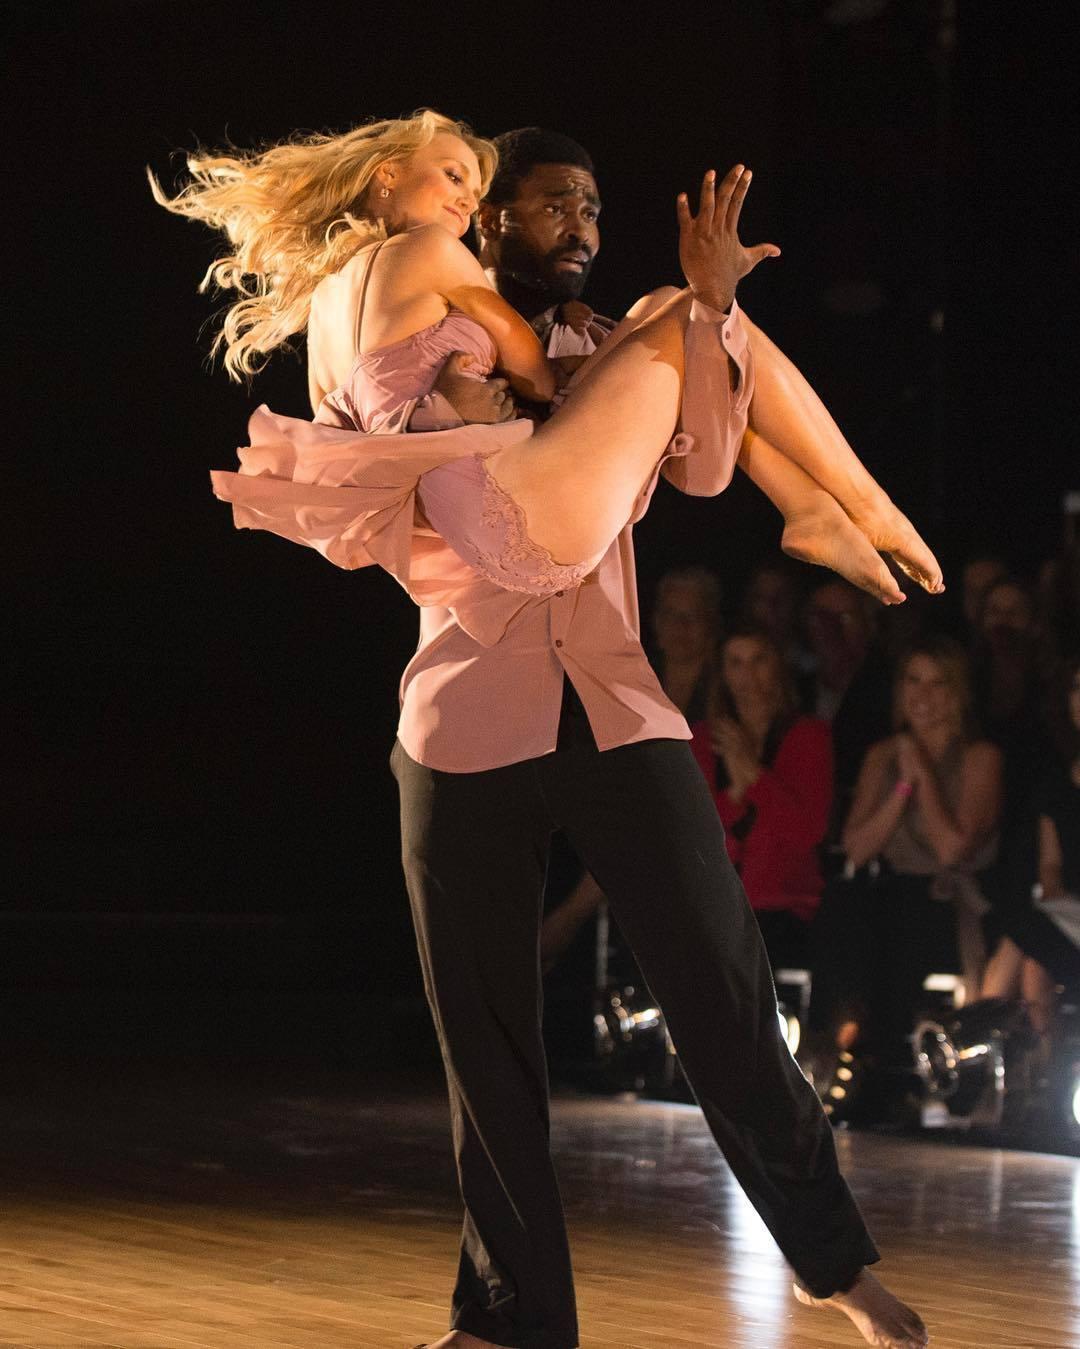 https://pics.wikifeet.com/Evanna-Lynch-Feet-3838129.jpg